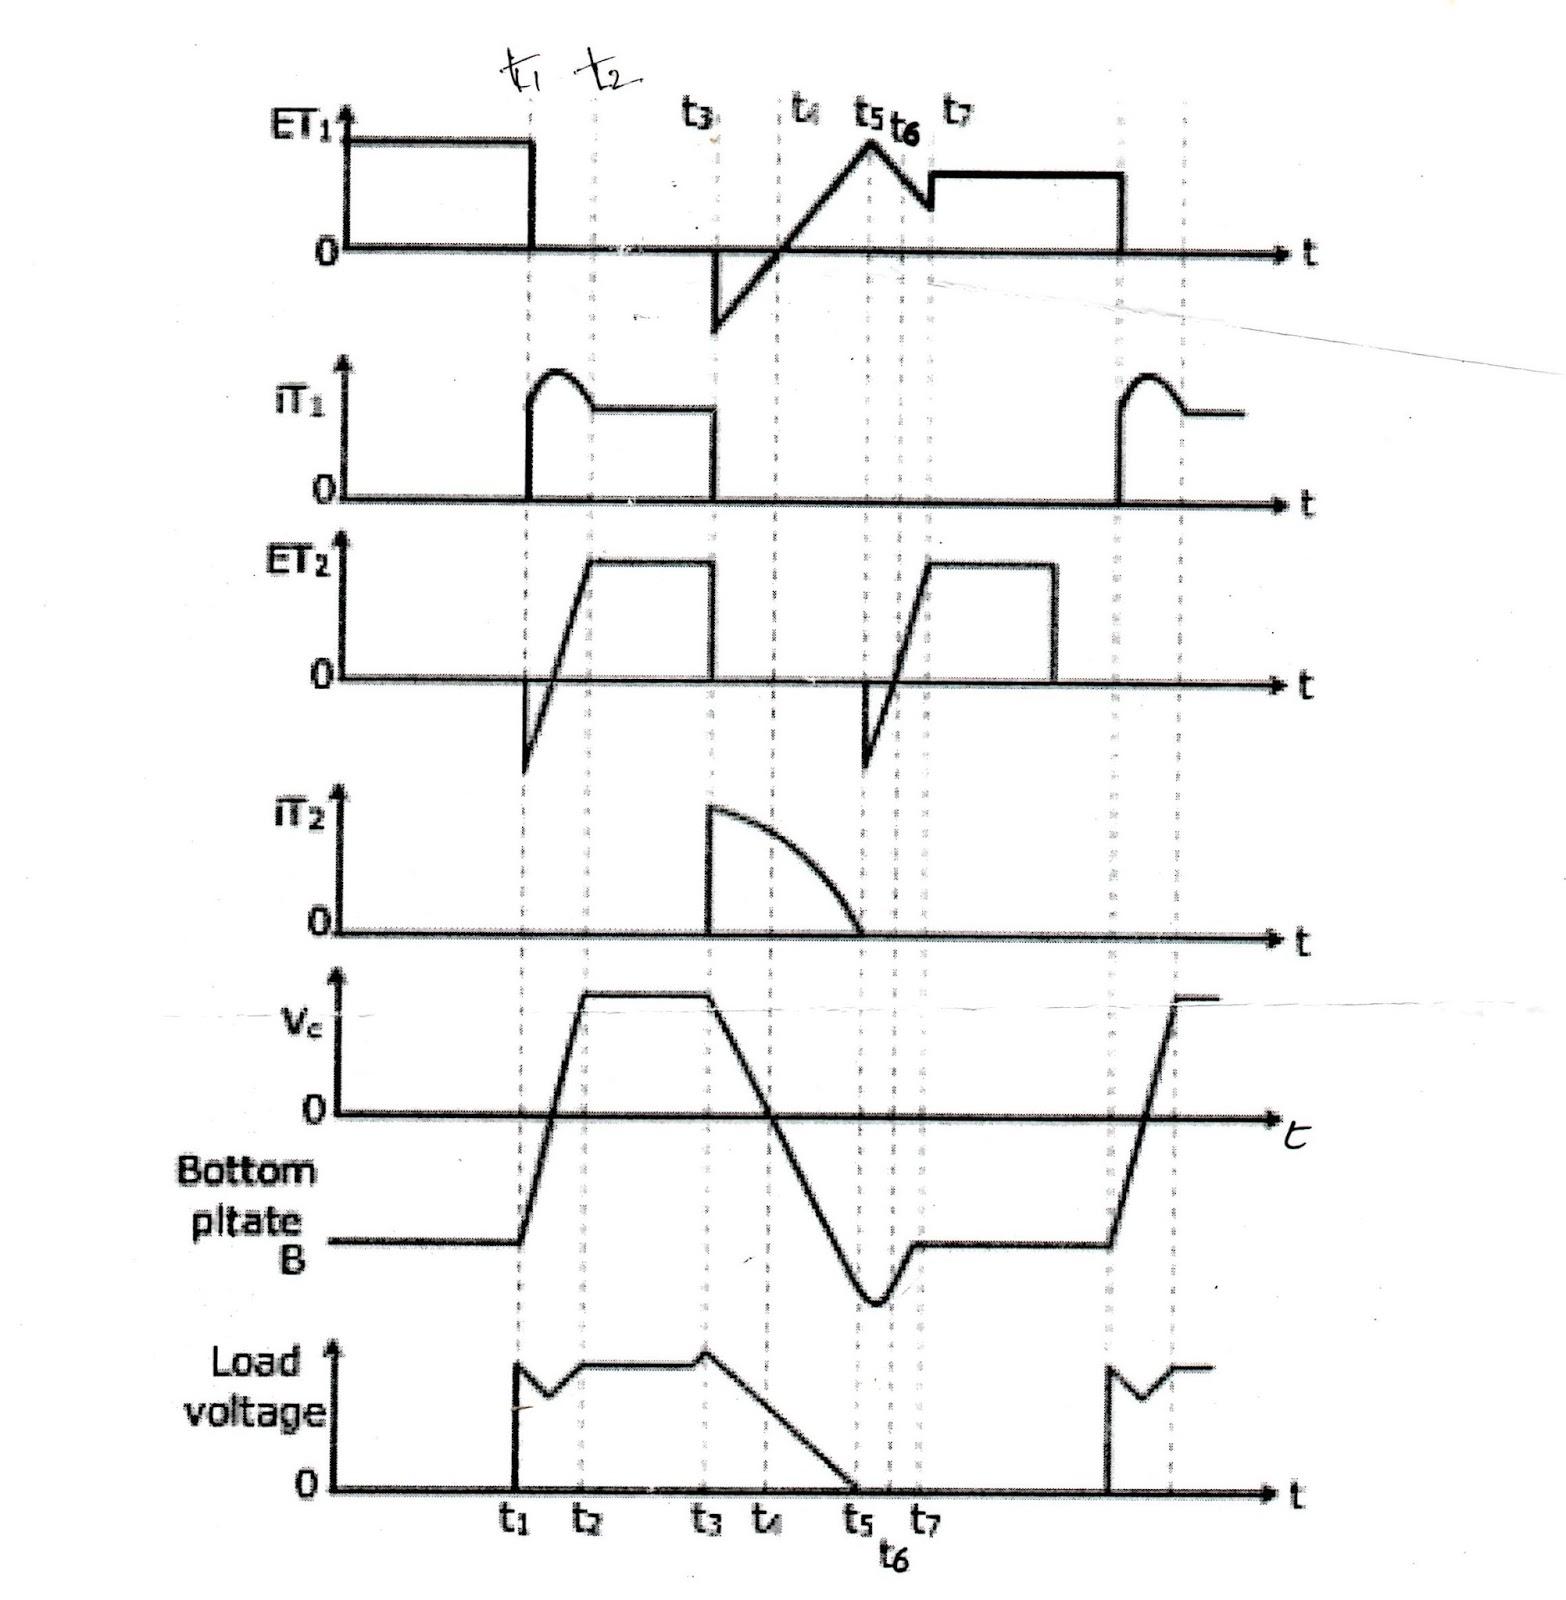 small resolution of engineering notes jones chopper engineering notes deep fryer diagram circuit diagram jones chopper